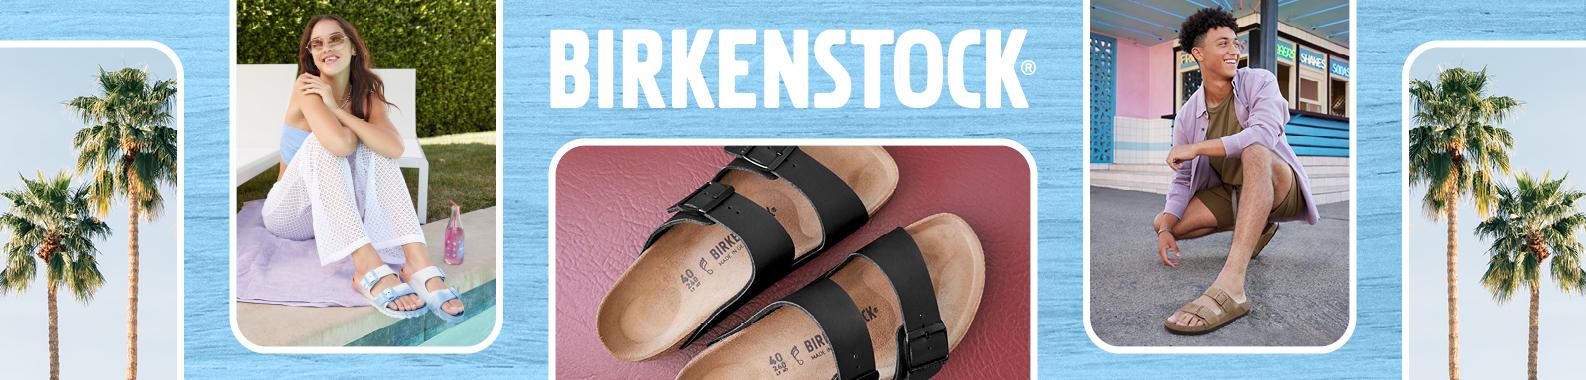 Birkenstock brand header image